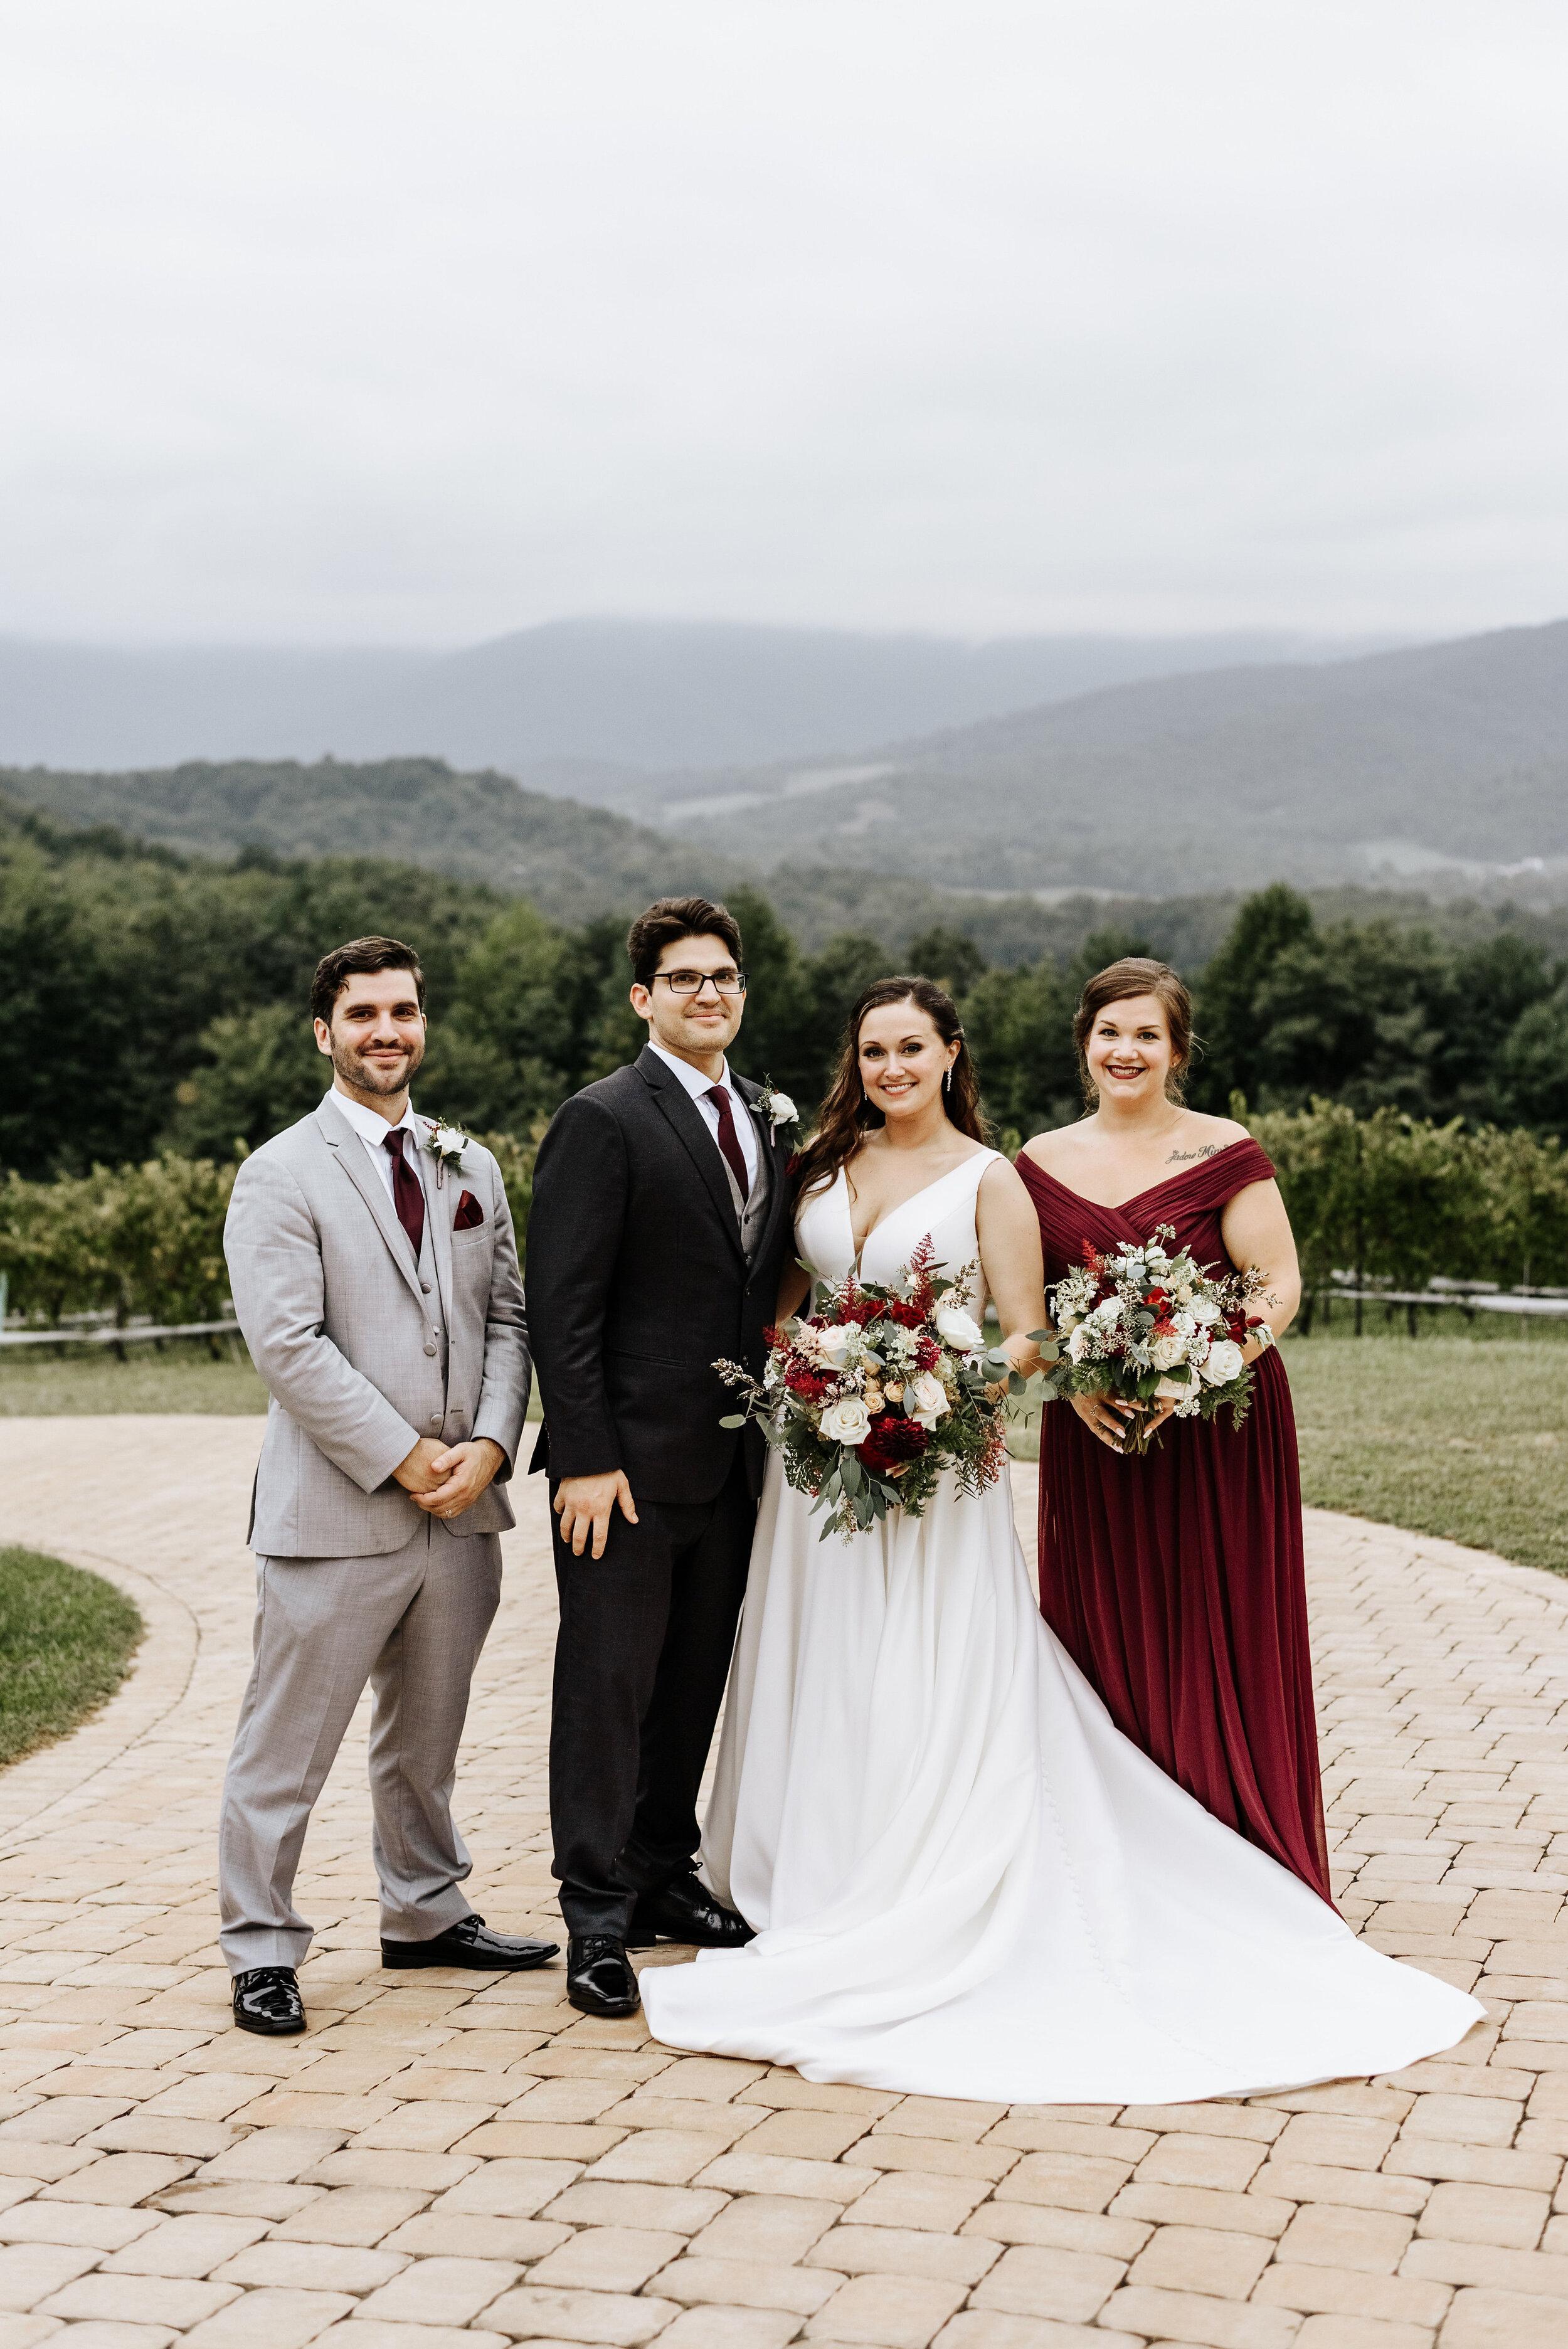 Allison_Nolan_Moss_Vineyards_Wedding_Charlottesville_Virginia_Photography_by_V_53.jpg